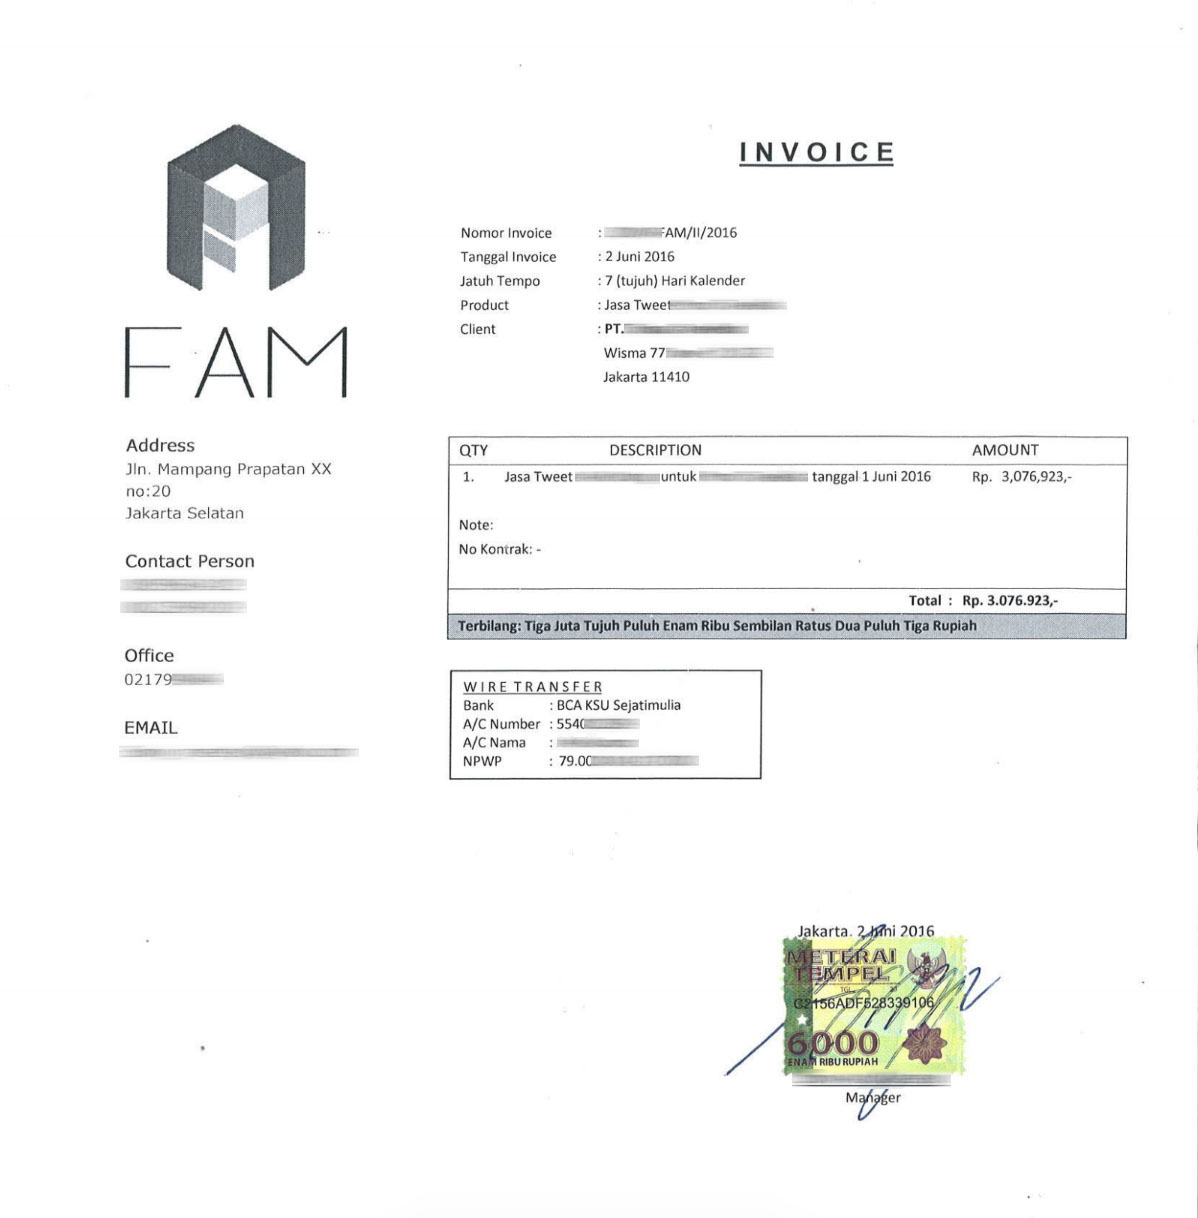 Contoh Invoice Tagihan Gaji - Xmast 3